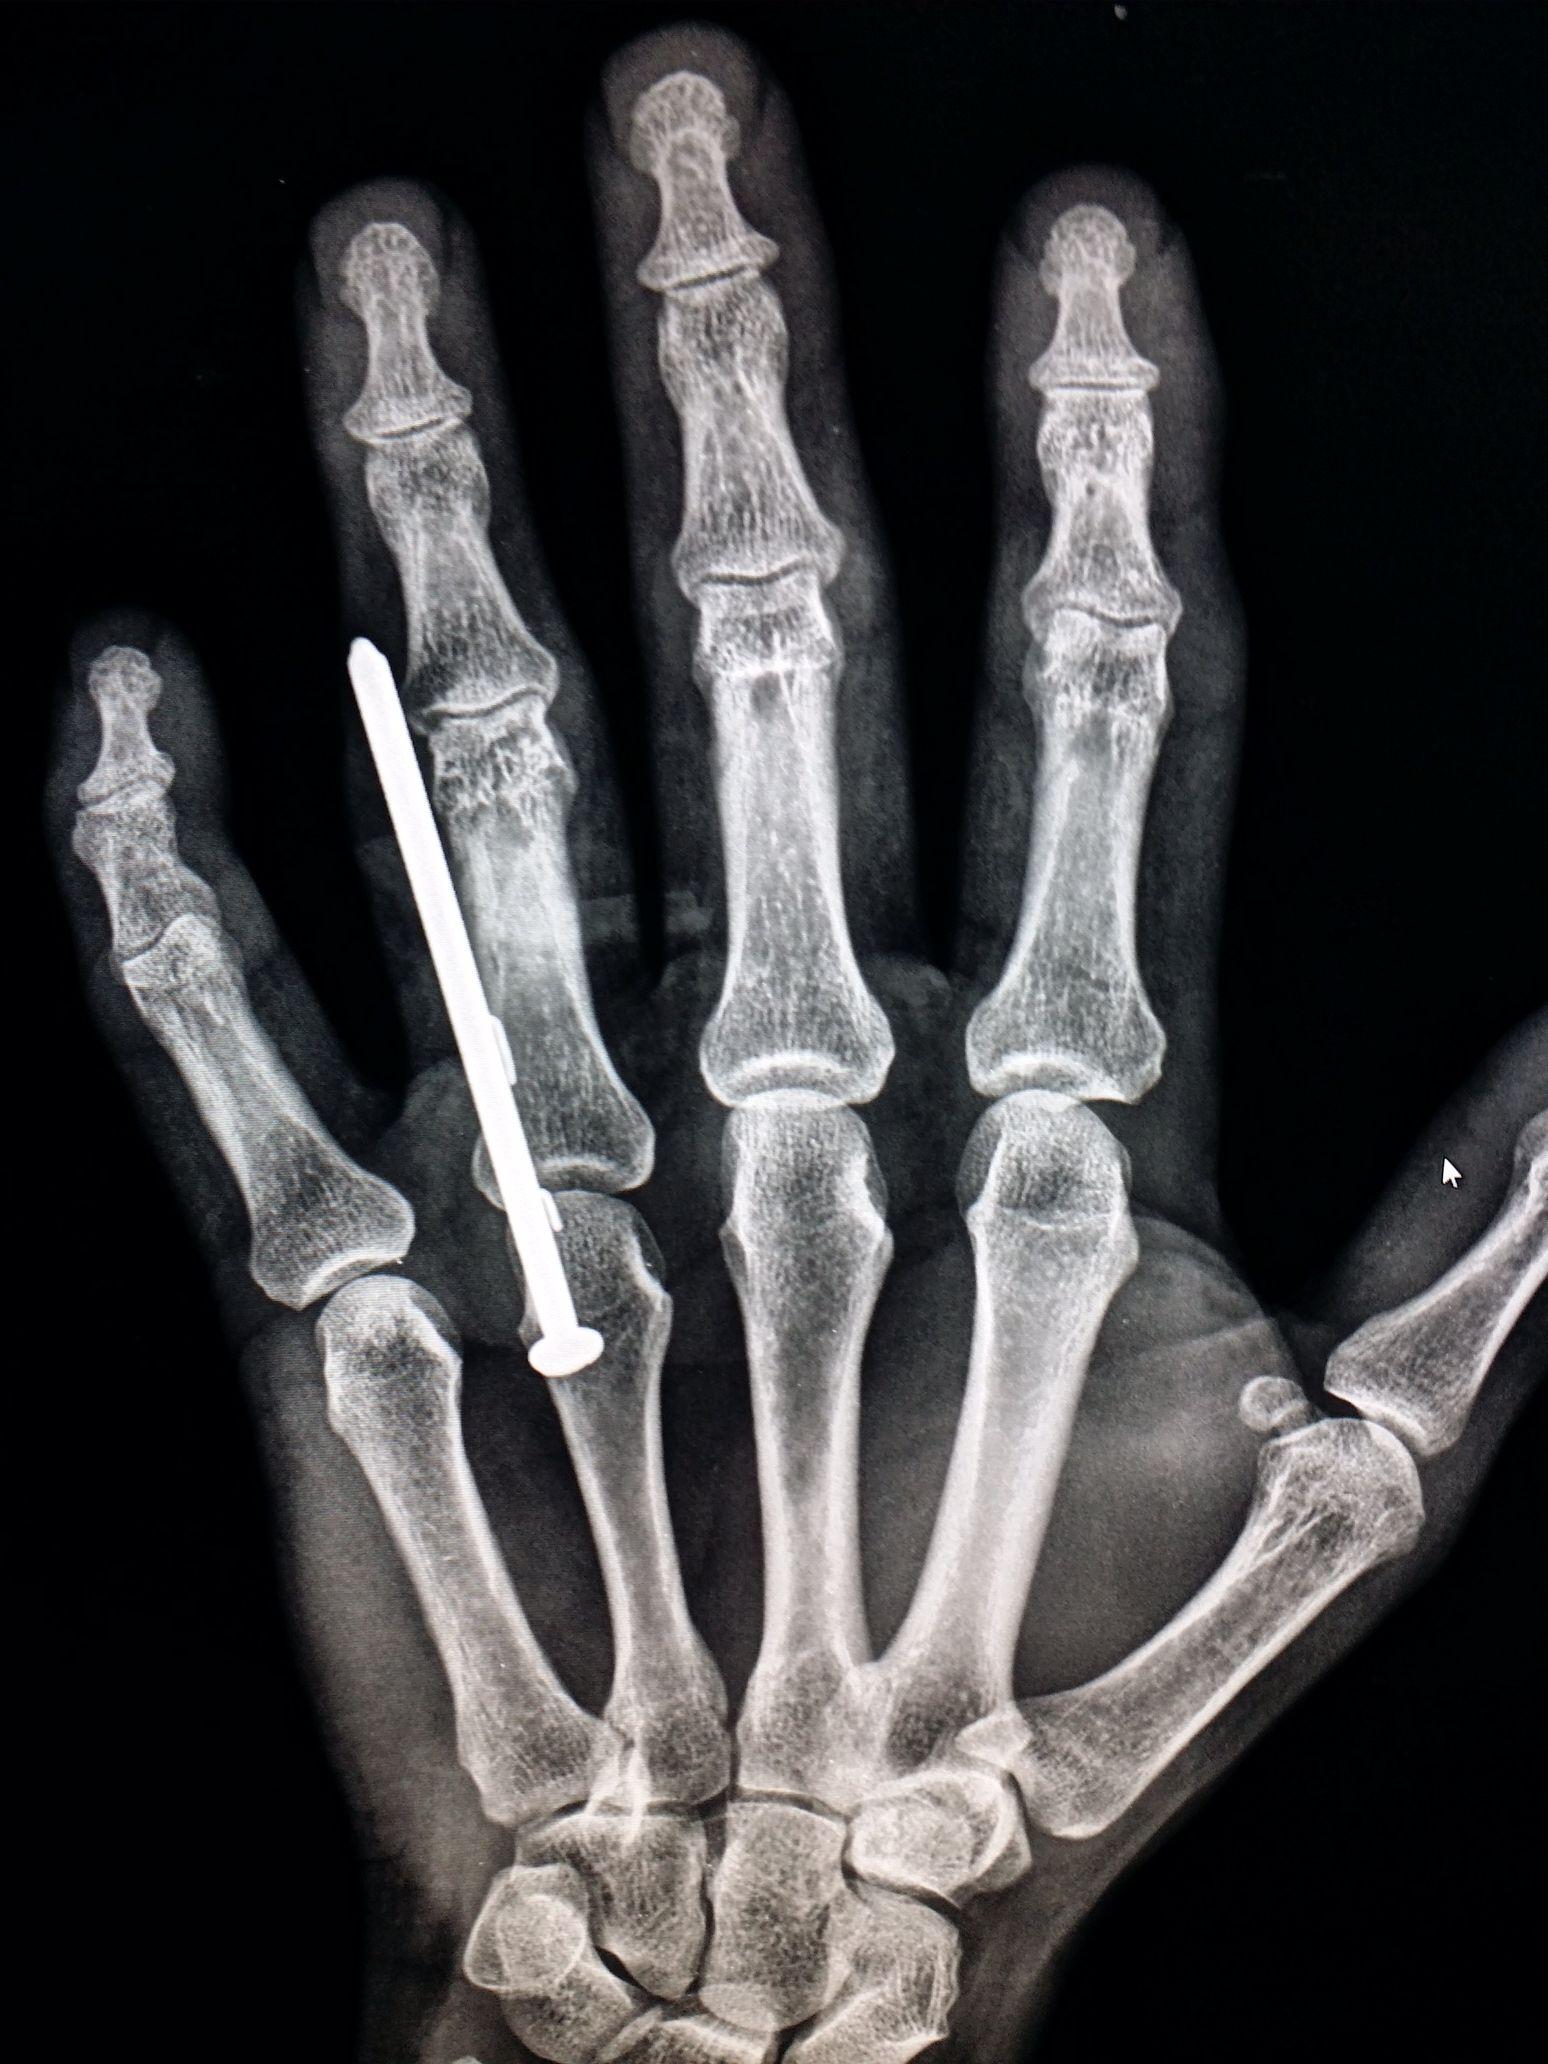 Xray of a #hand. #Nail #gun #accident. #trauma #radiologist ...